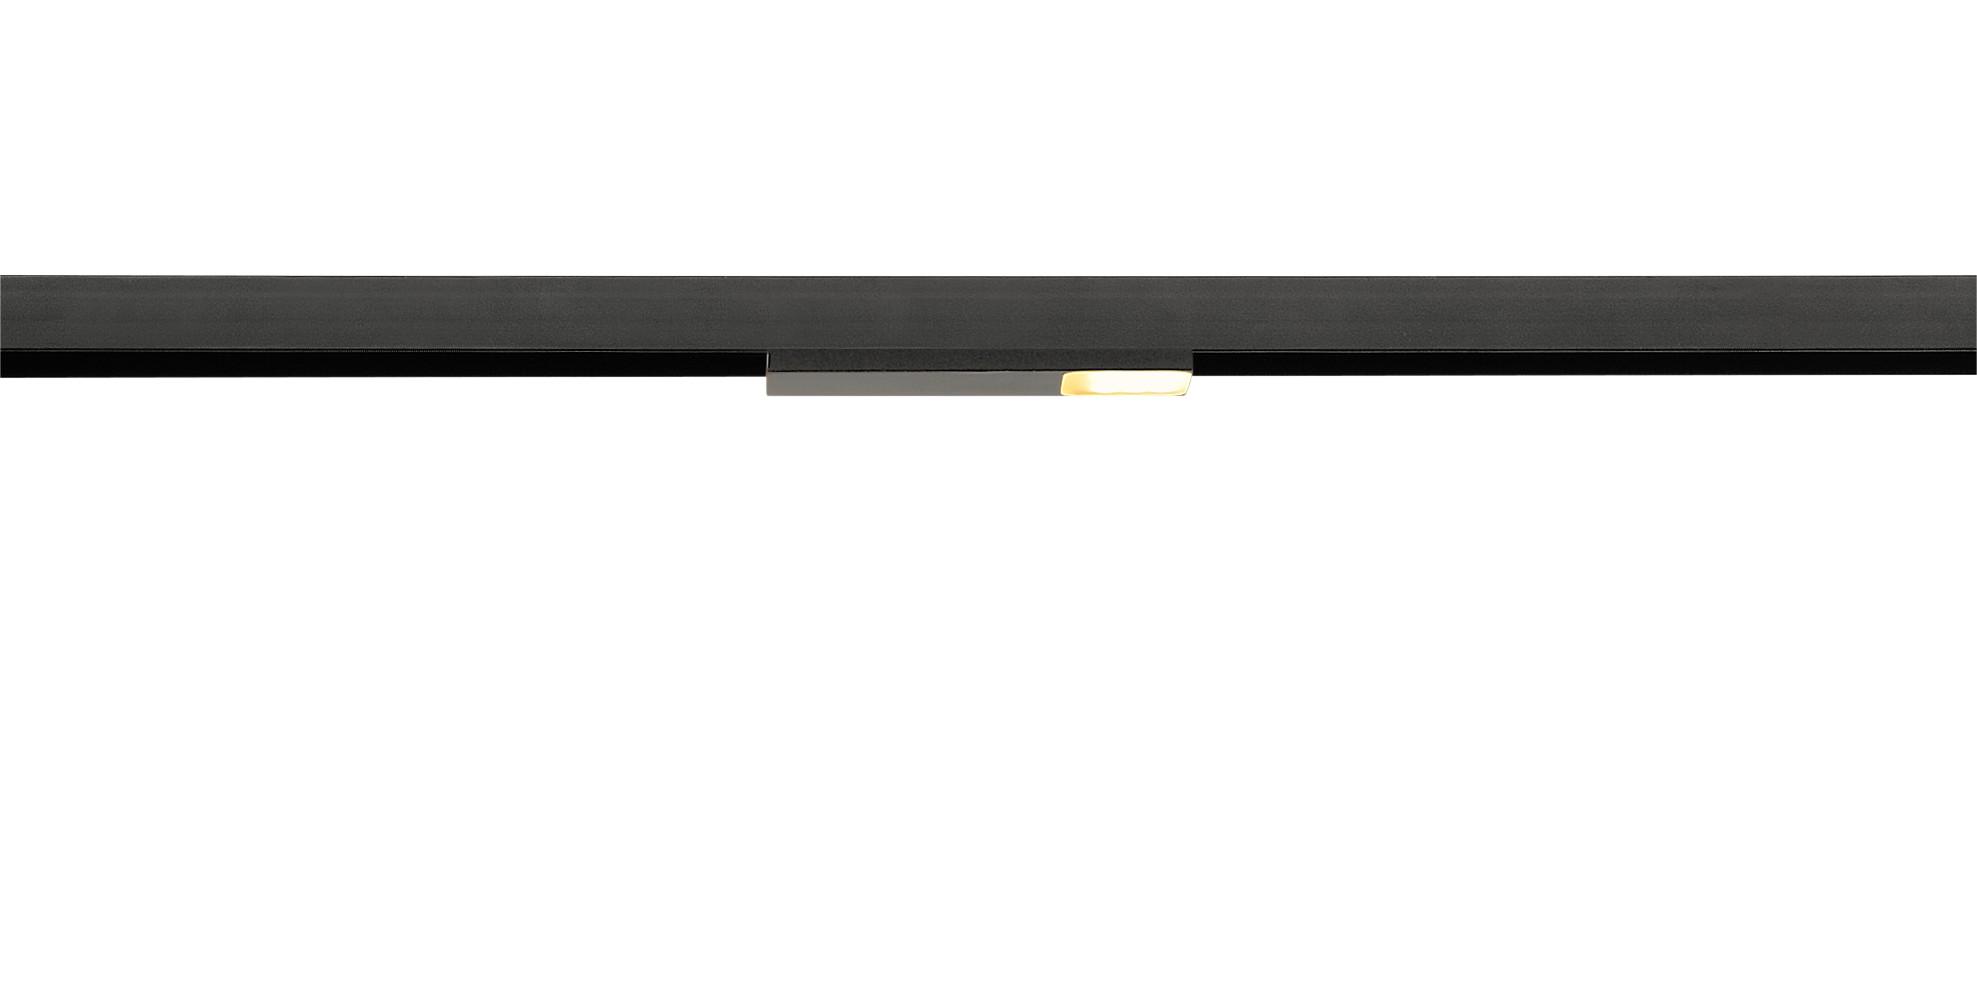 1 Stk M-TRACK, Flat Light für M-TRACK, Vitrinenschiene, 4,8W LI188540--